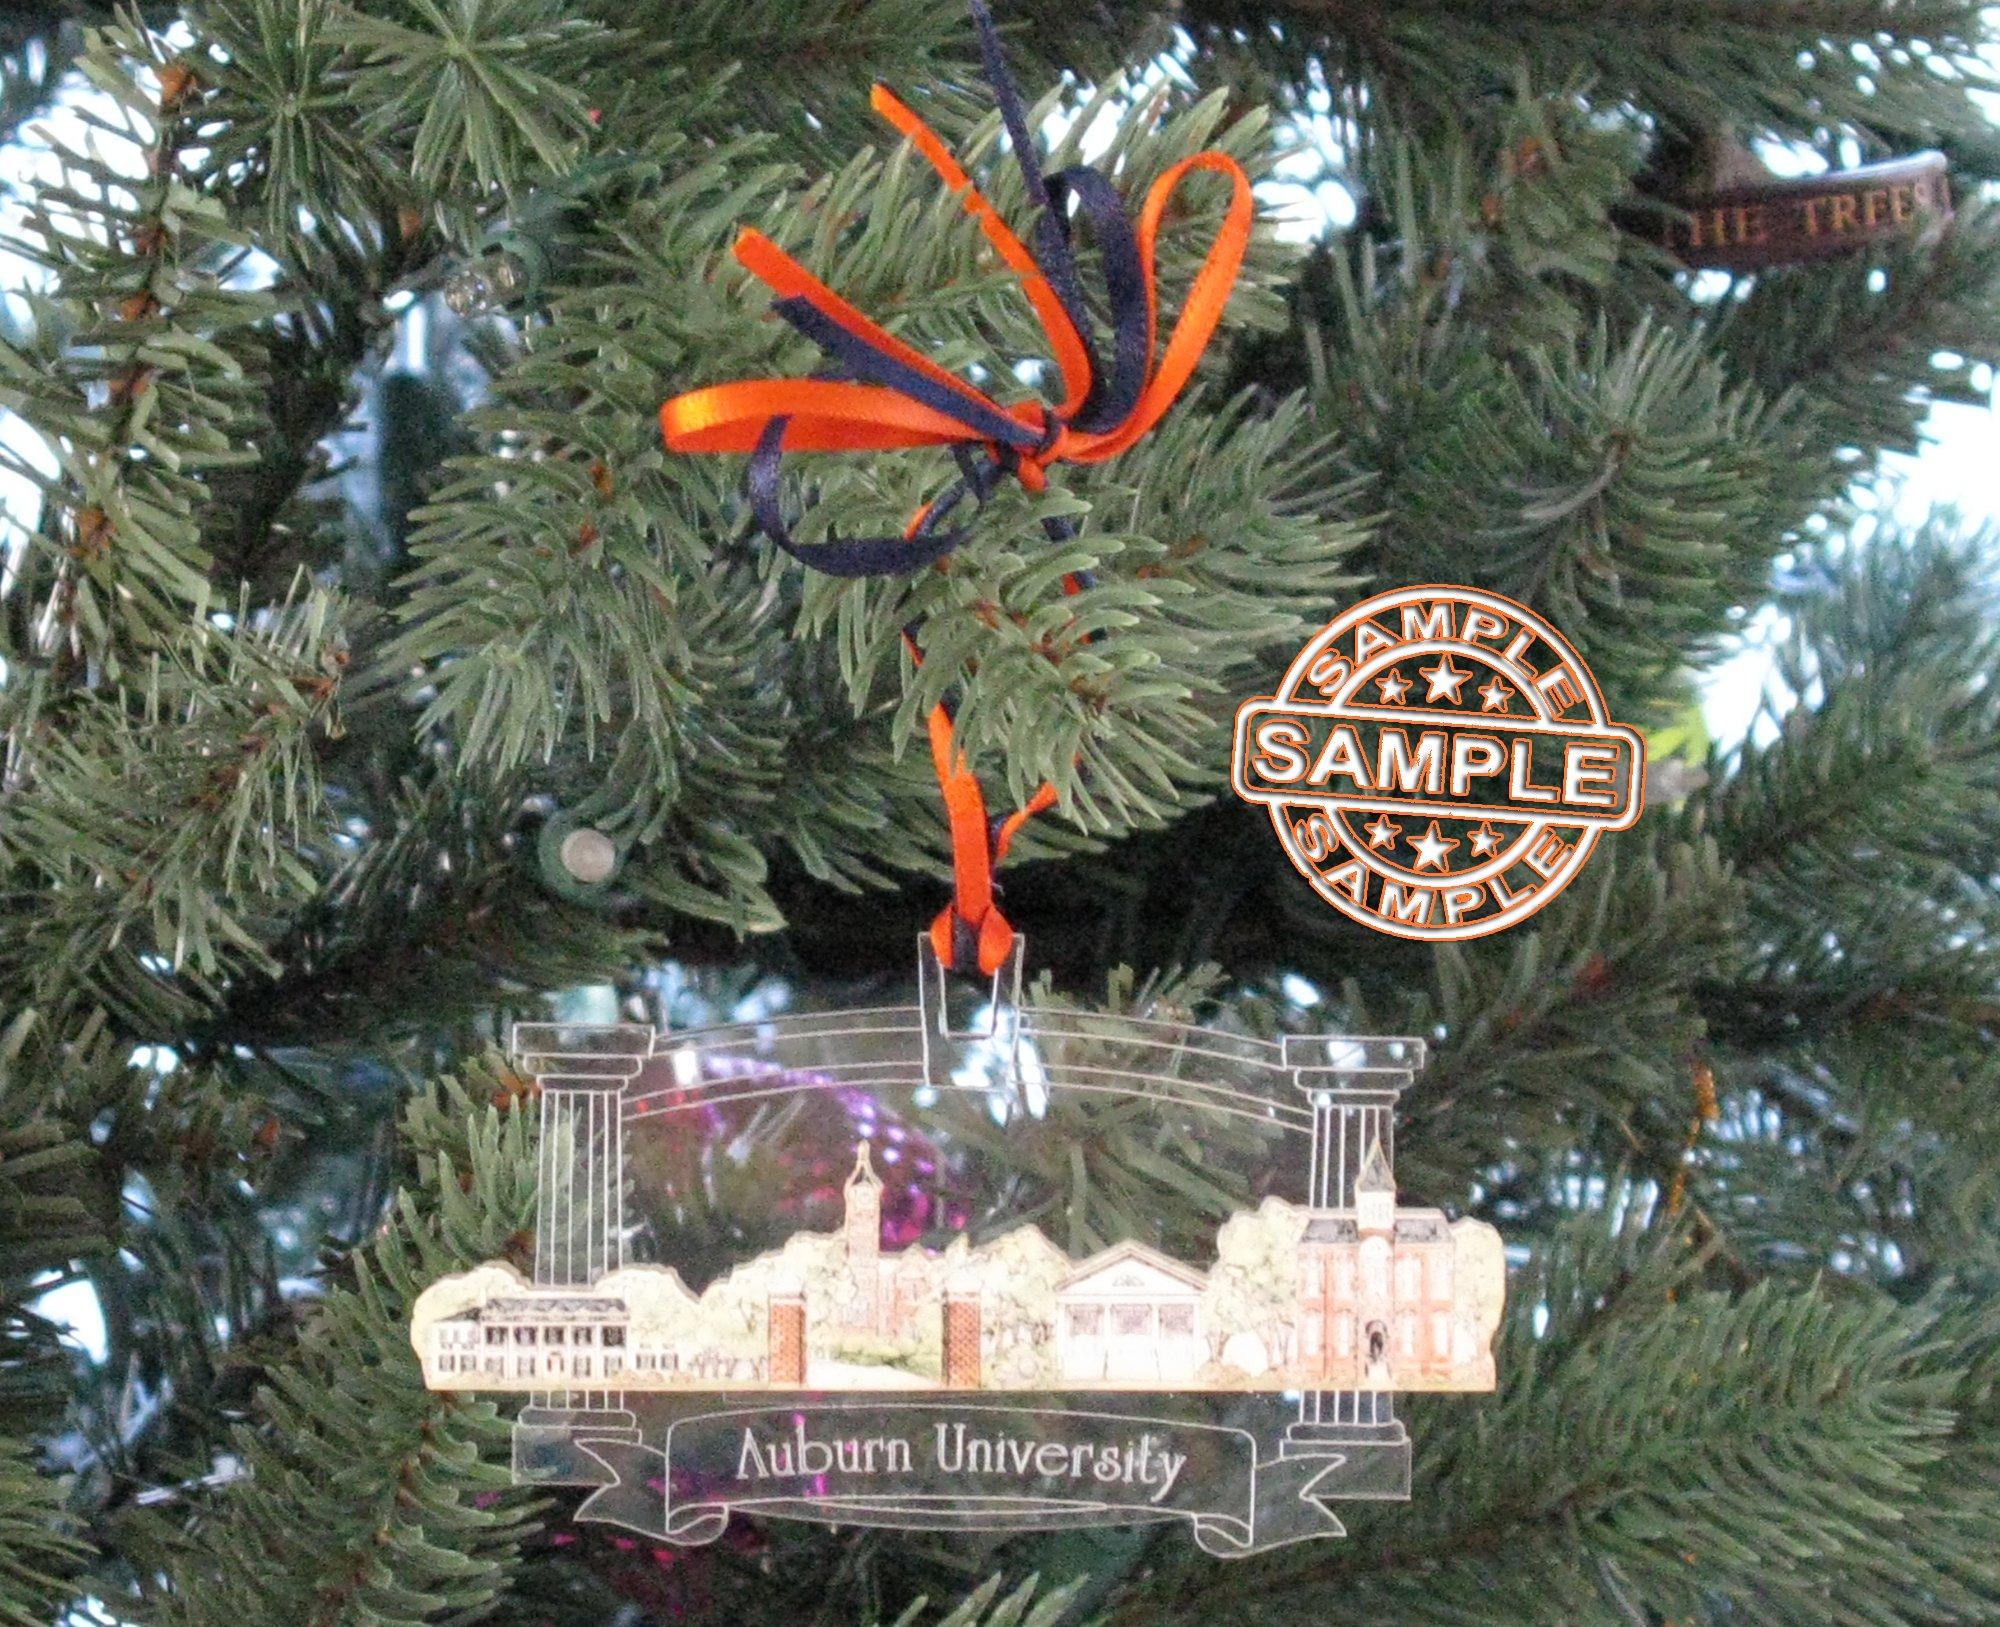 Randolf - Macon College - Collegiate Sculptured Ornament